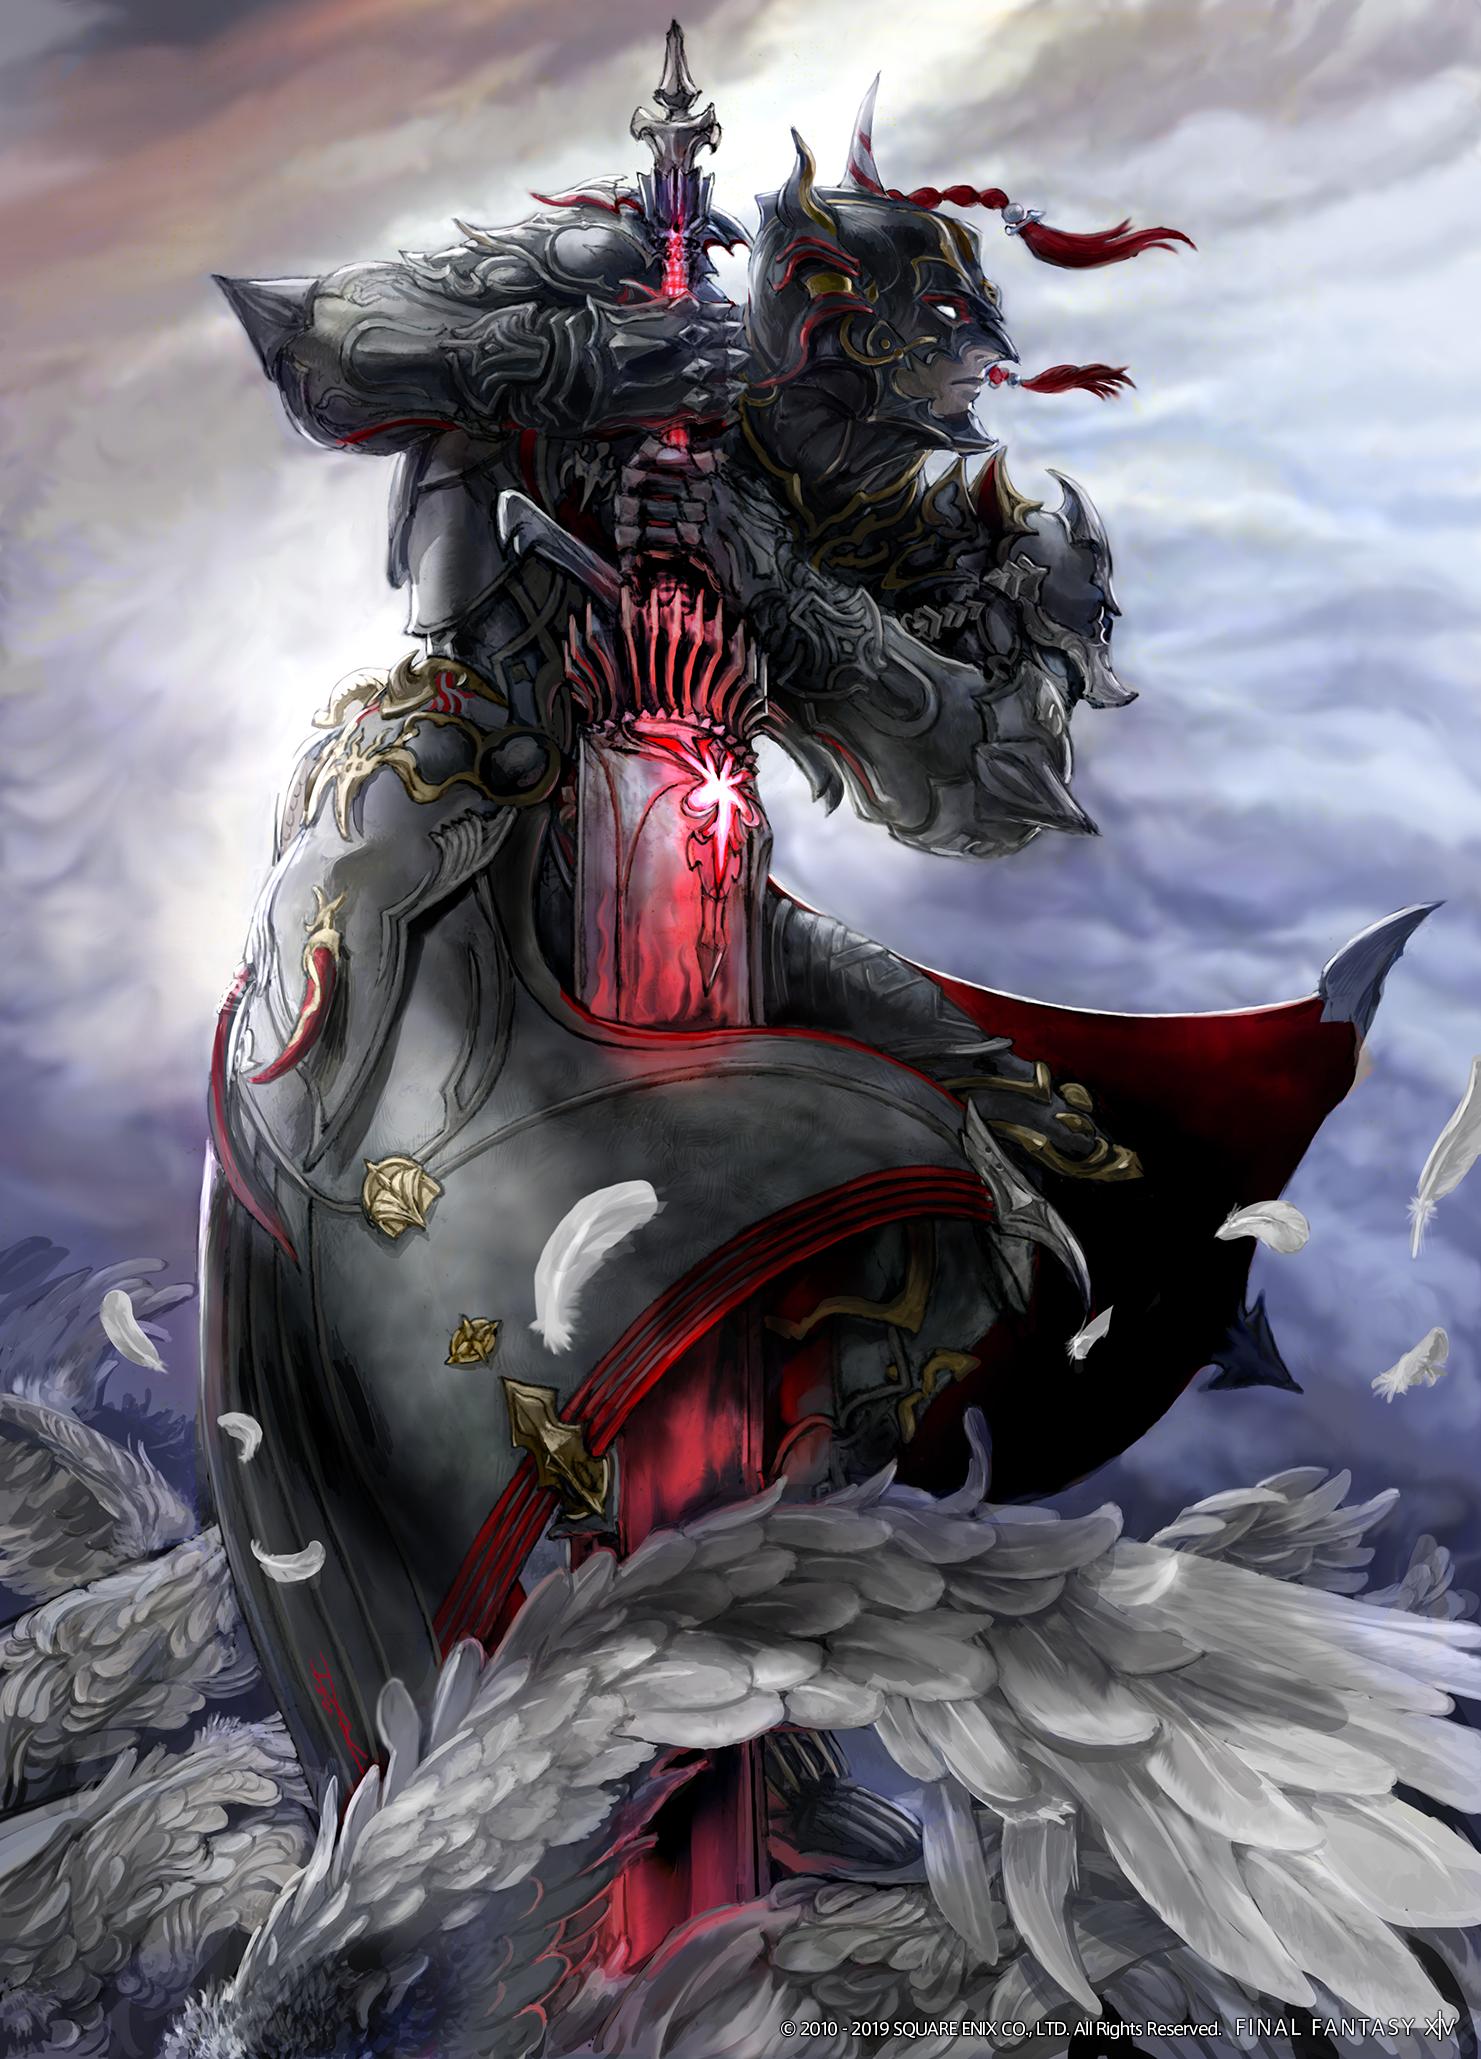 Final Fantasy XIV: Shadowbringers' Twist Is a Total 180